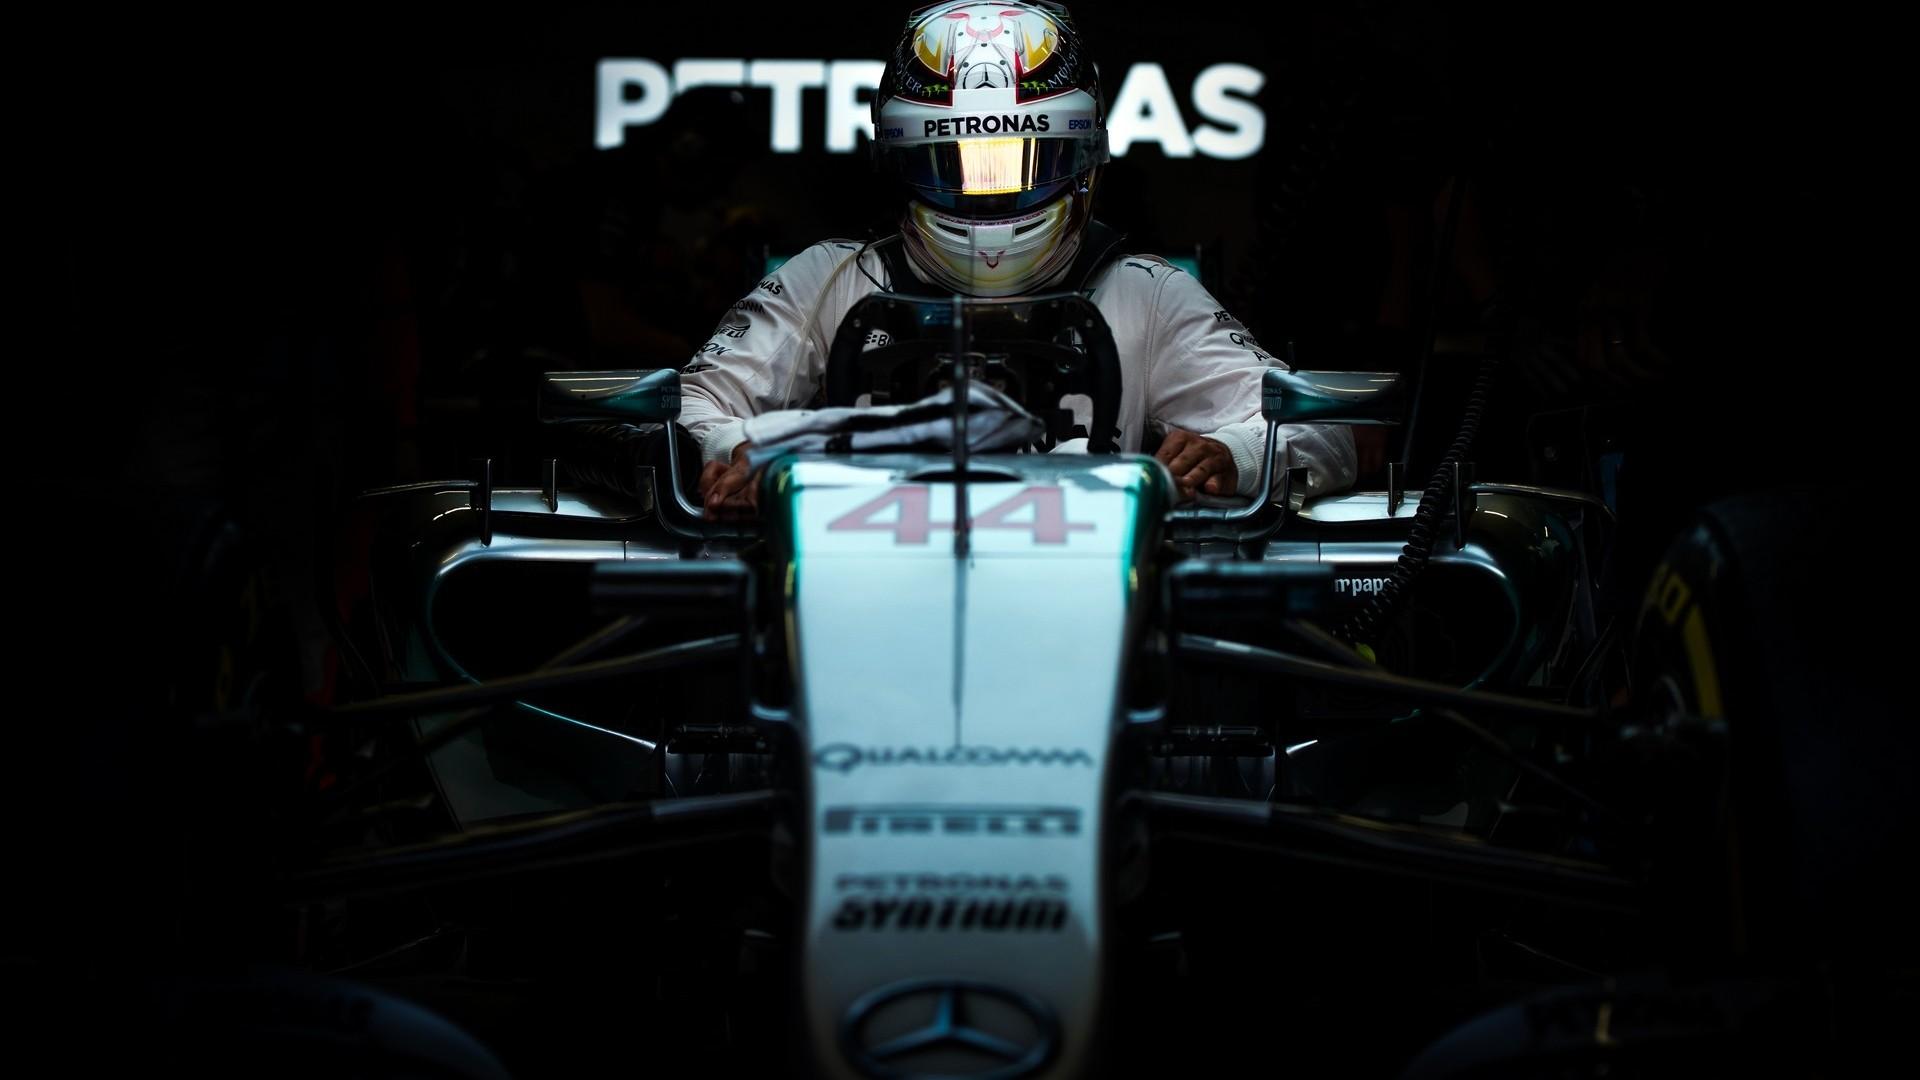 General 1920x1080 Formula 1 world champion Lewis Hamilton Mercedes-Benz